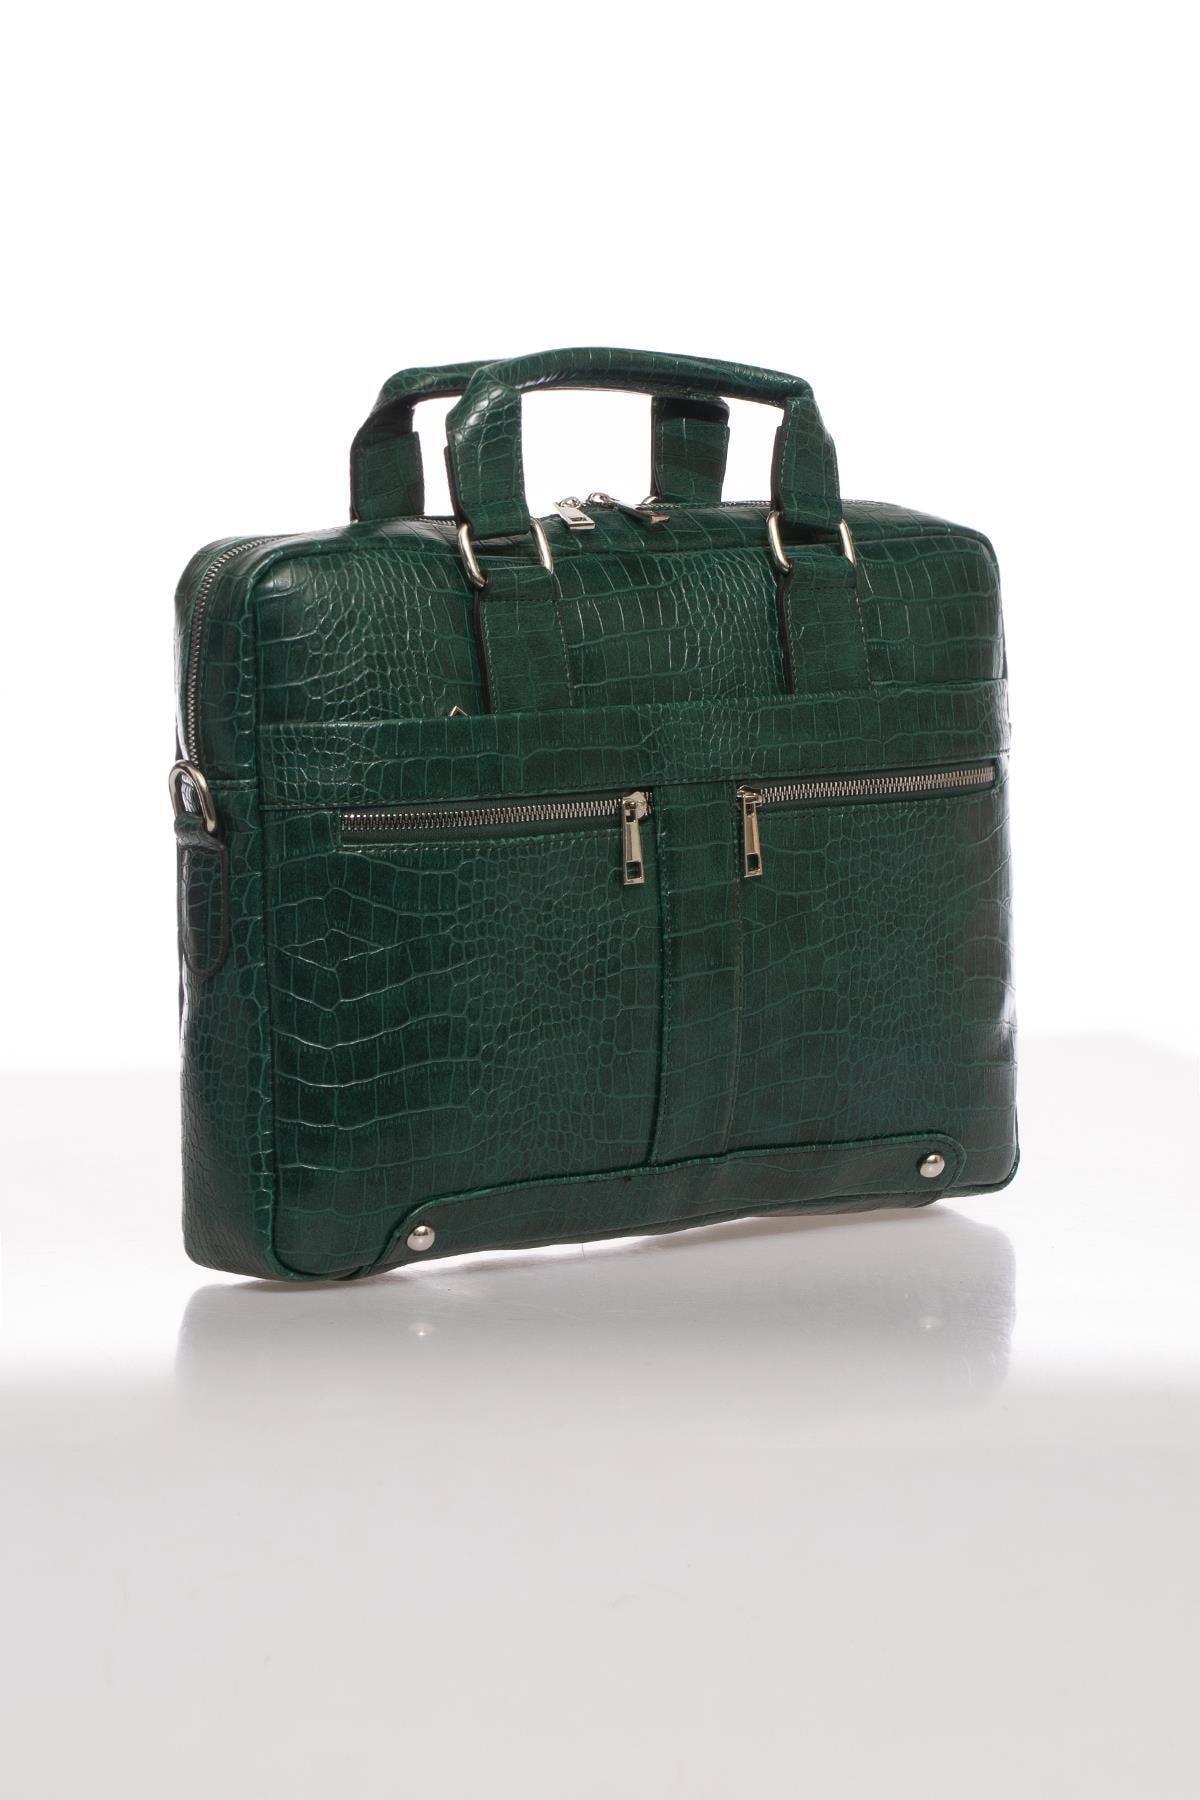 Sergio Giorgianni Luxury Mpist9141 Kroko Yeşil Unısex Evrak Çantası 2